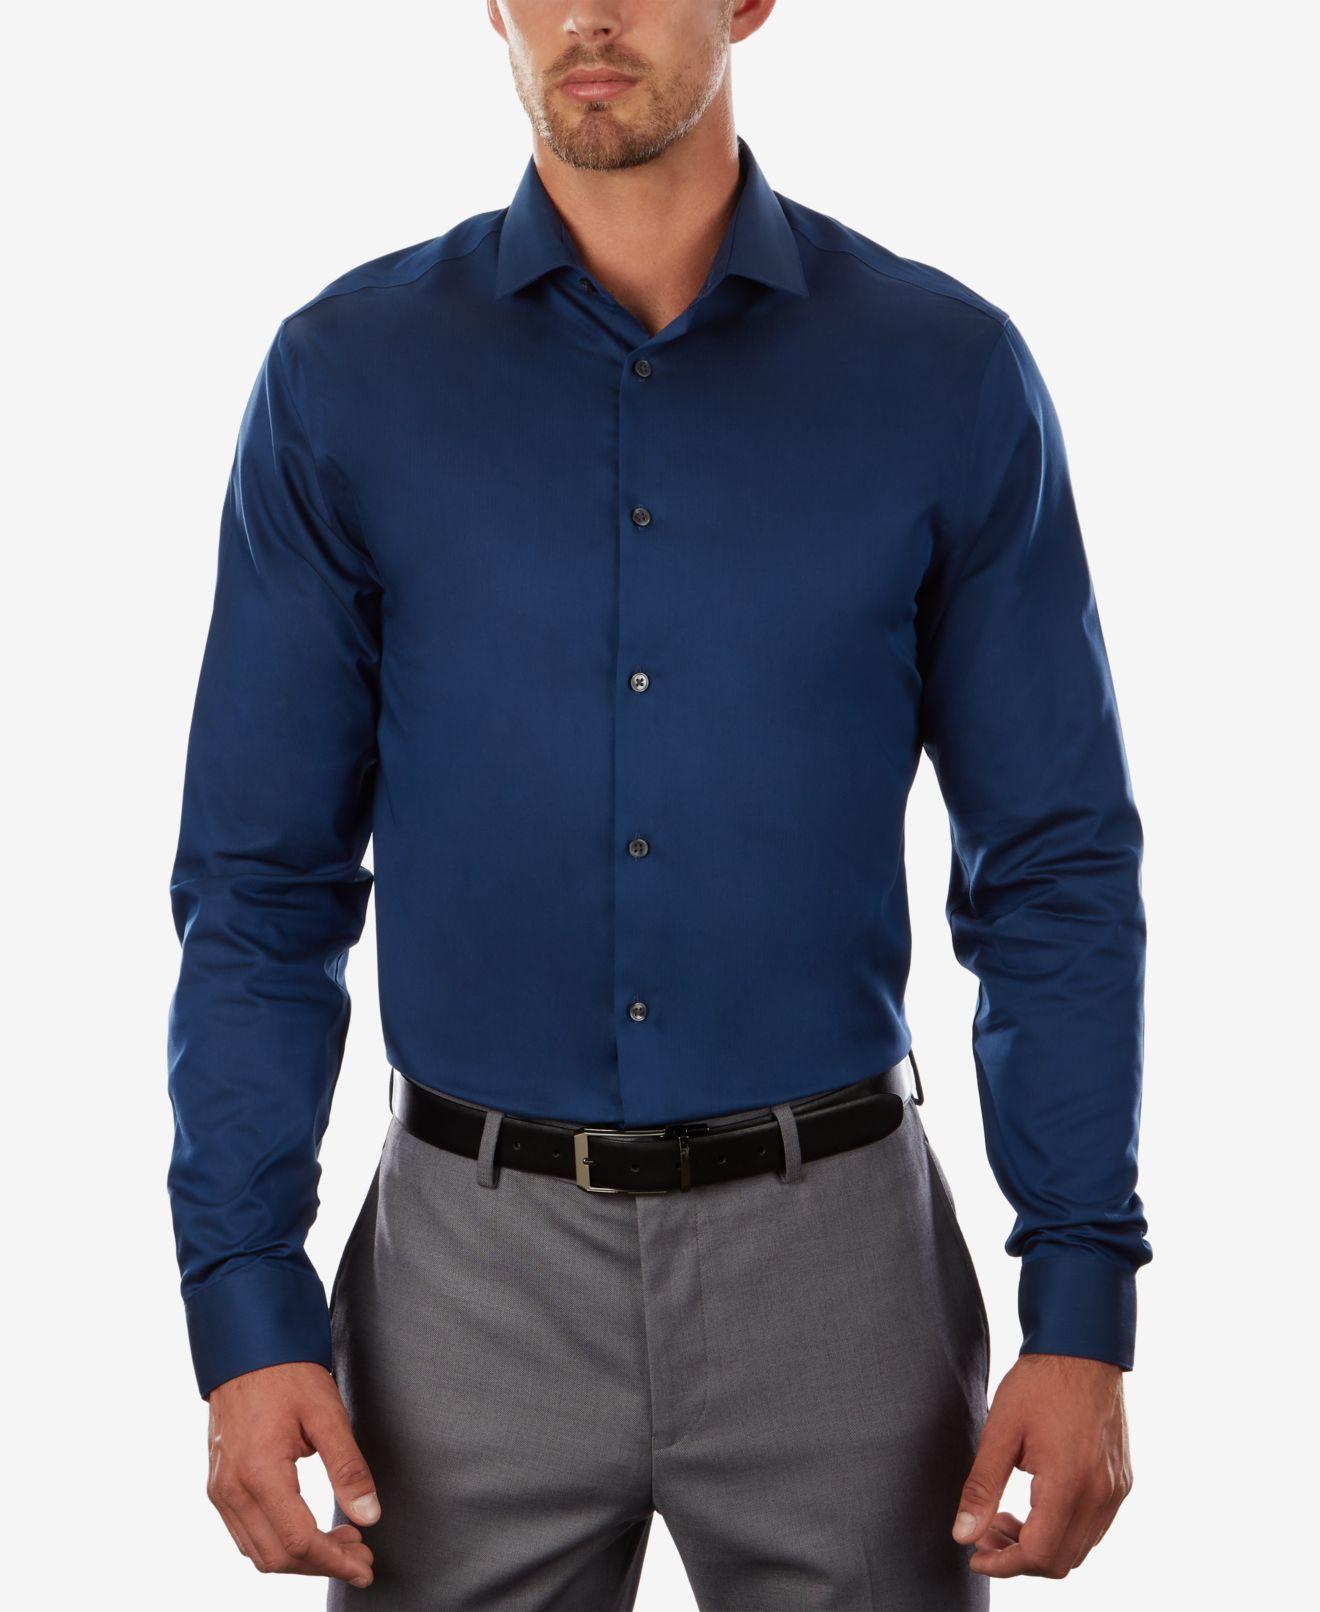 Calvin Klein Mens Dress Shirt Blue Size 15 Extreme Slim Fit Button-Down